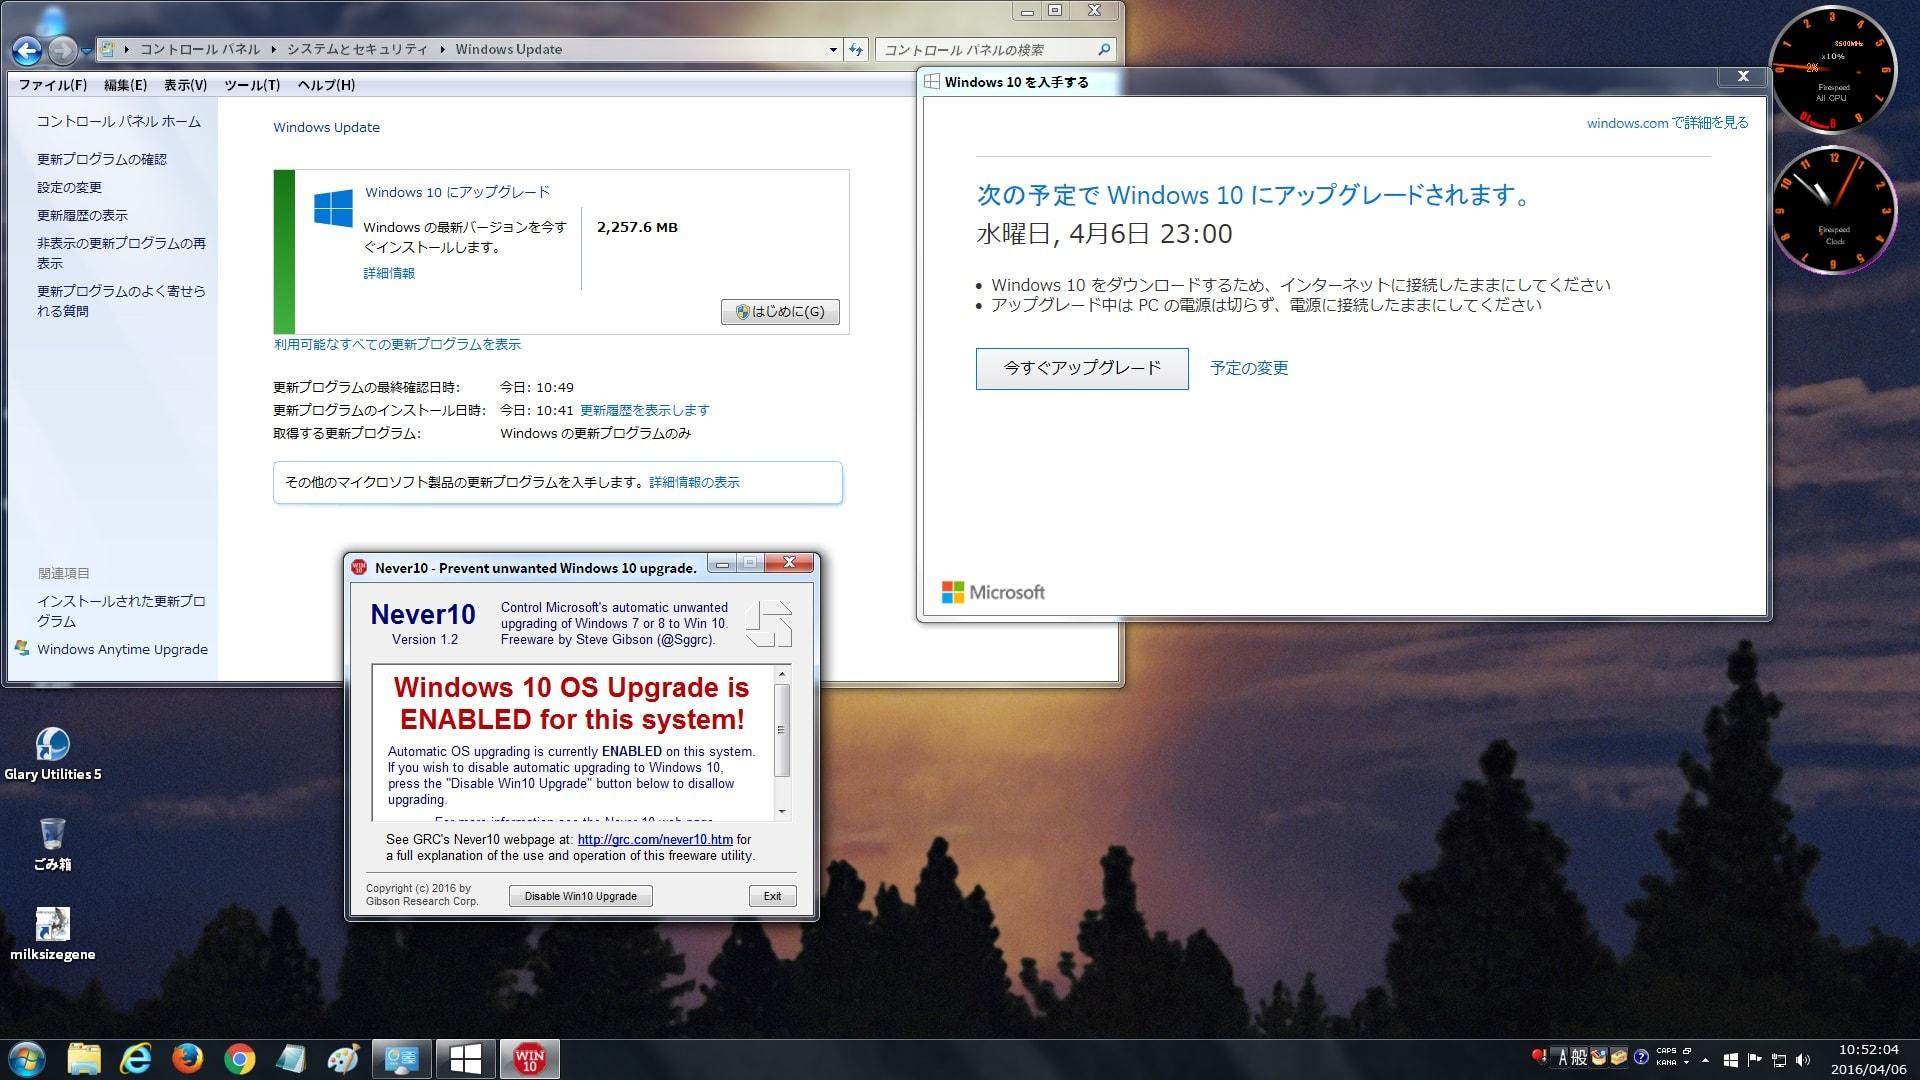 http://art17.photozou.jp/pub/119/2912119/photo/235202945_org.v1459908993.jpg